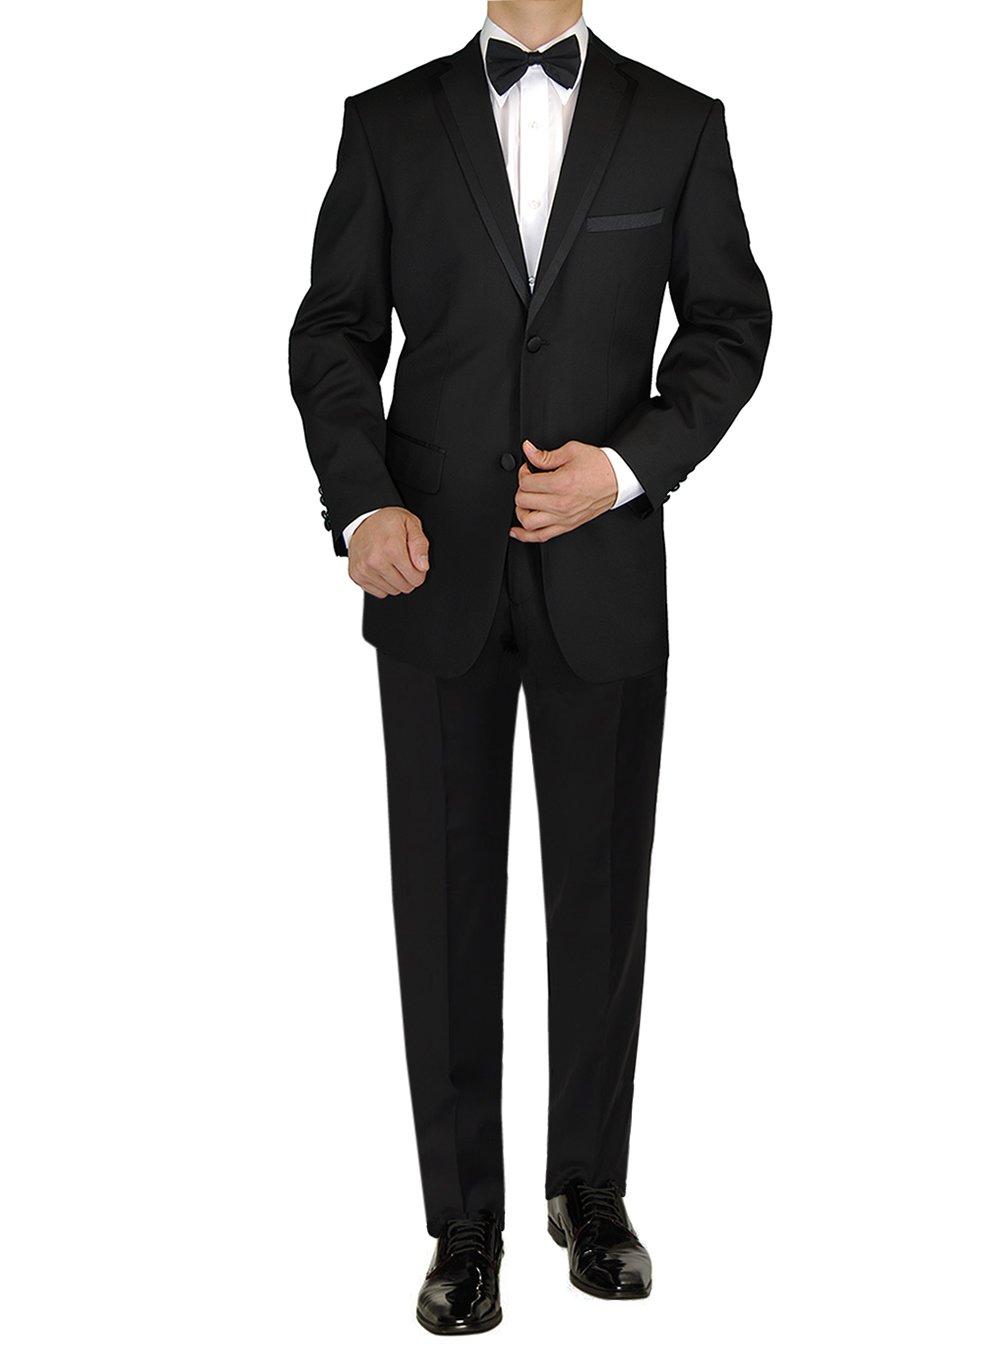 GN GIORGIO NAPOLI Men's Tuxedo Suit 2 Button Notch Lapel Jacket Adjustable Pant (50 Regular US, black) by GN GIORGIO NAPOLI